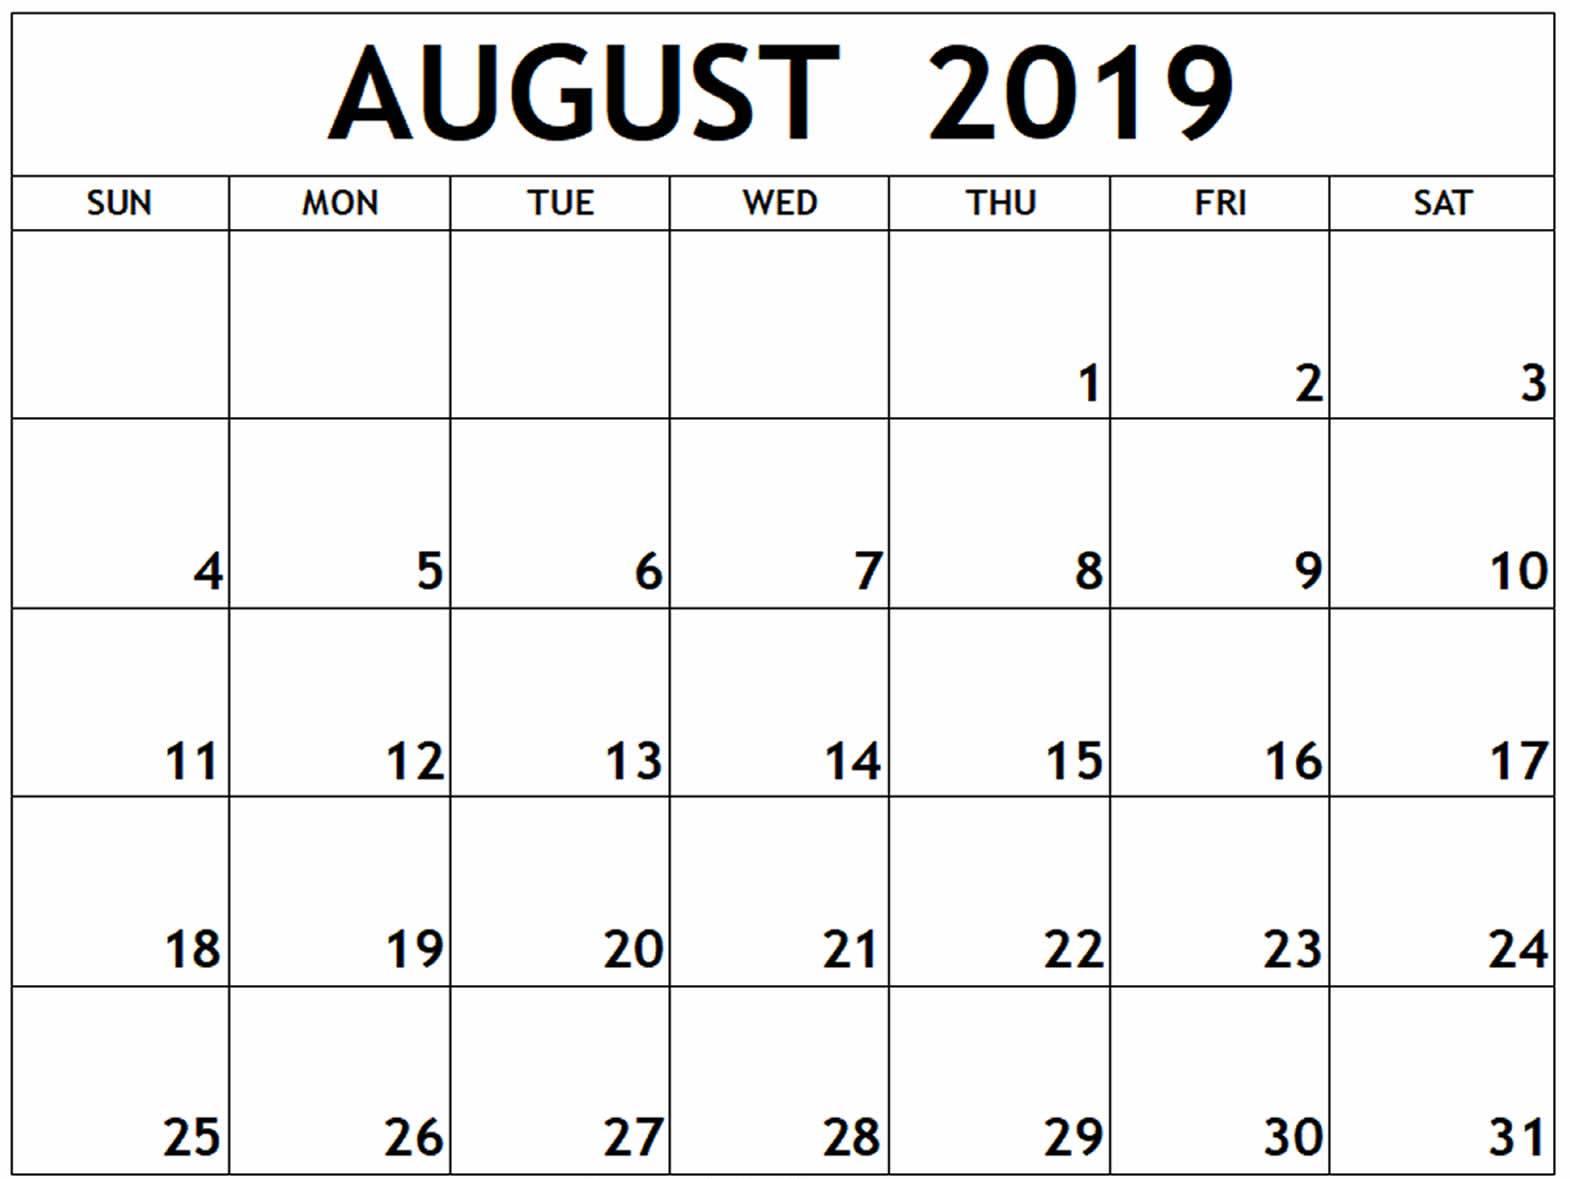 August 2019 Calendar Printable - Free August 2019 Calendar Printable pertaining to Calendar Template For August